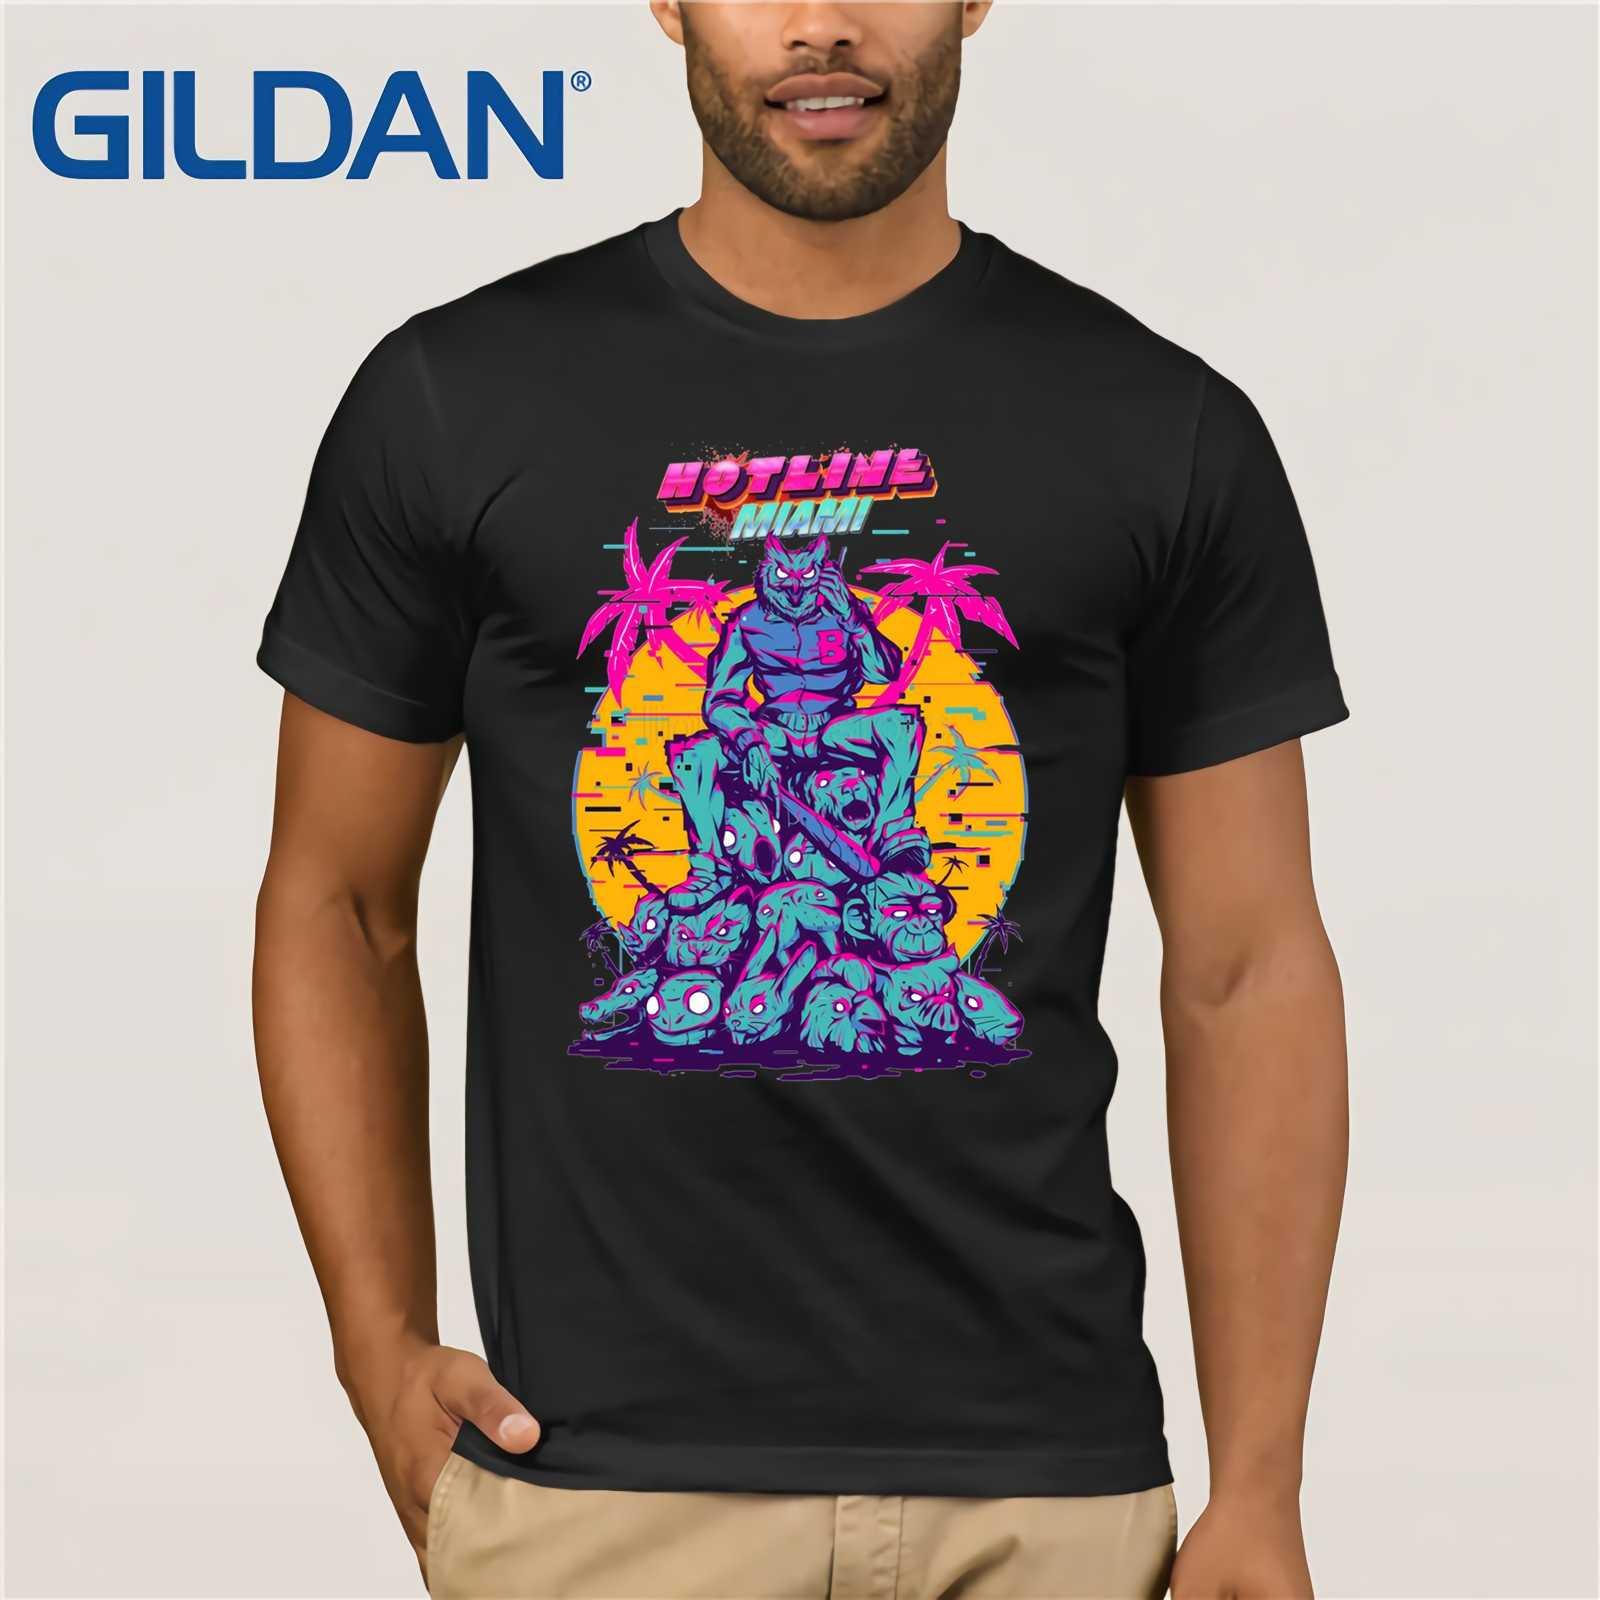 f309feda7 GILDAN Awesome Hotline Miami T-Shirts New Arrival Boy 100% Cotton T Shirts